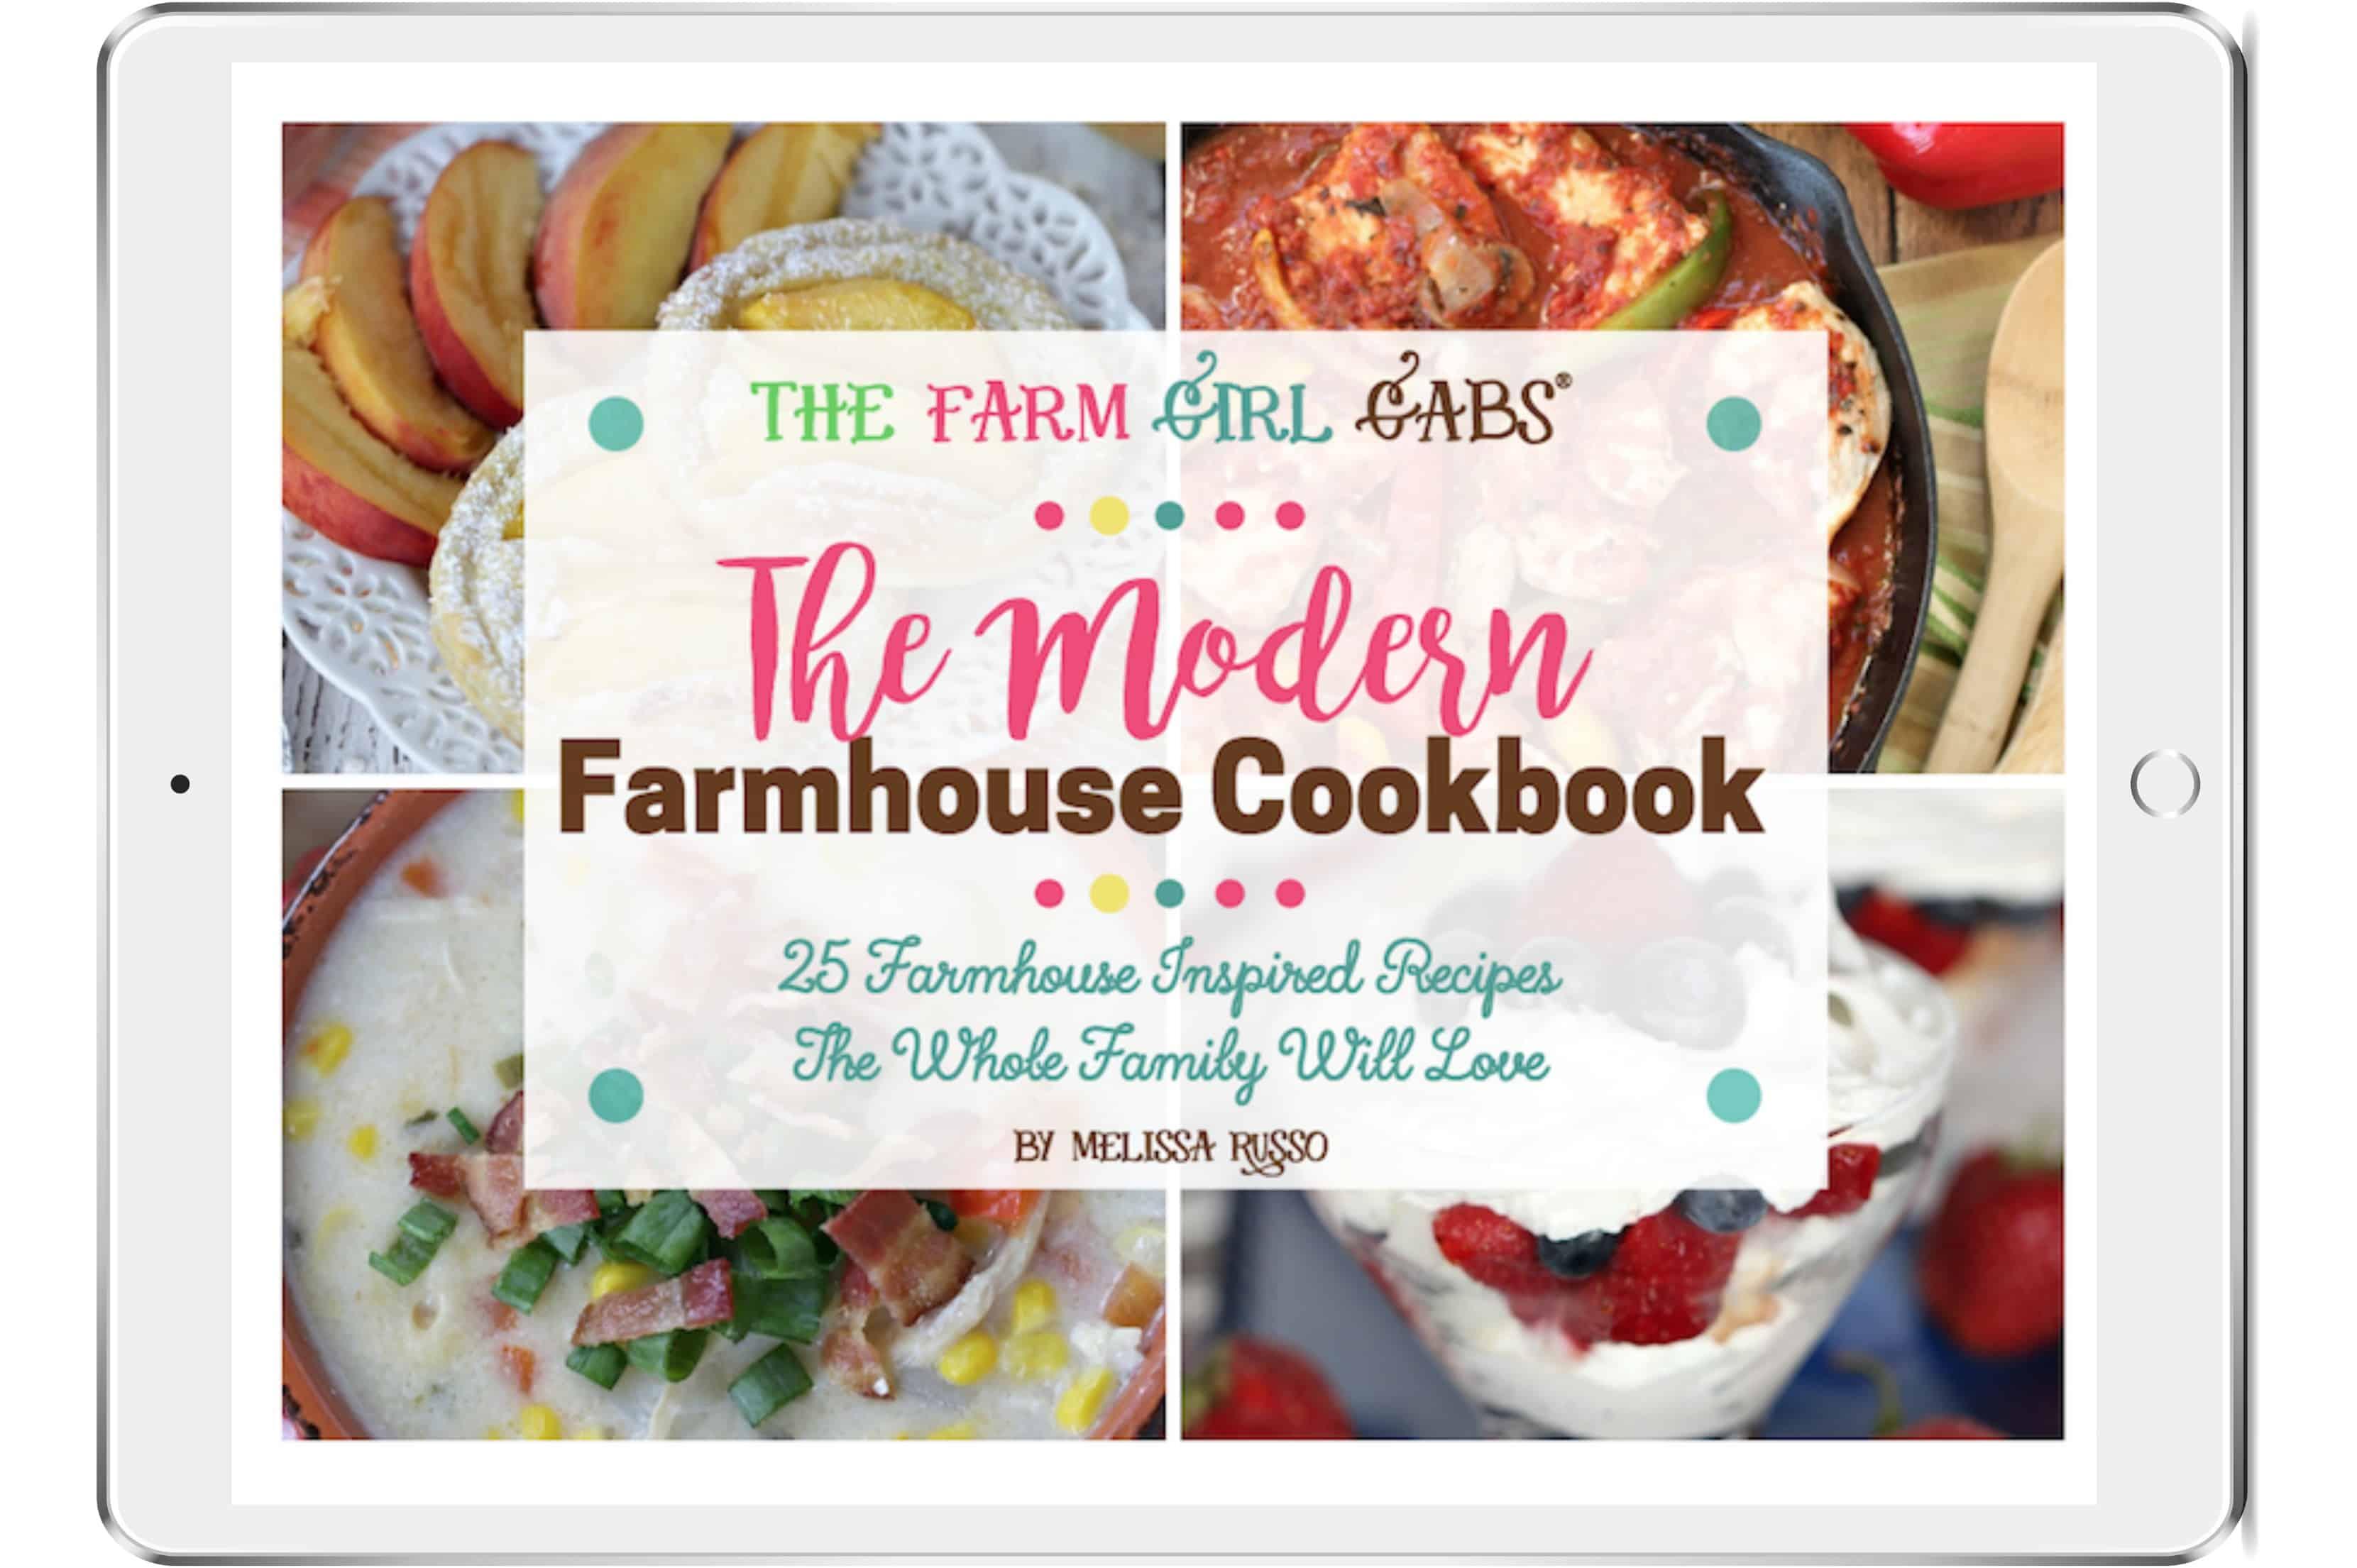 The Modern Farmhouse Cookbook: 25 Farmhouse Inspired Recipes The Whole Family Will Love - eCookbook My Books